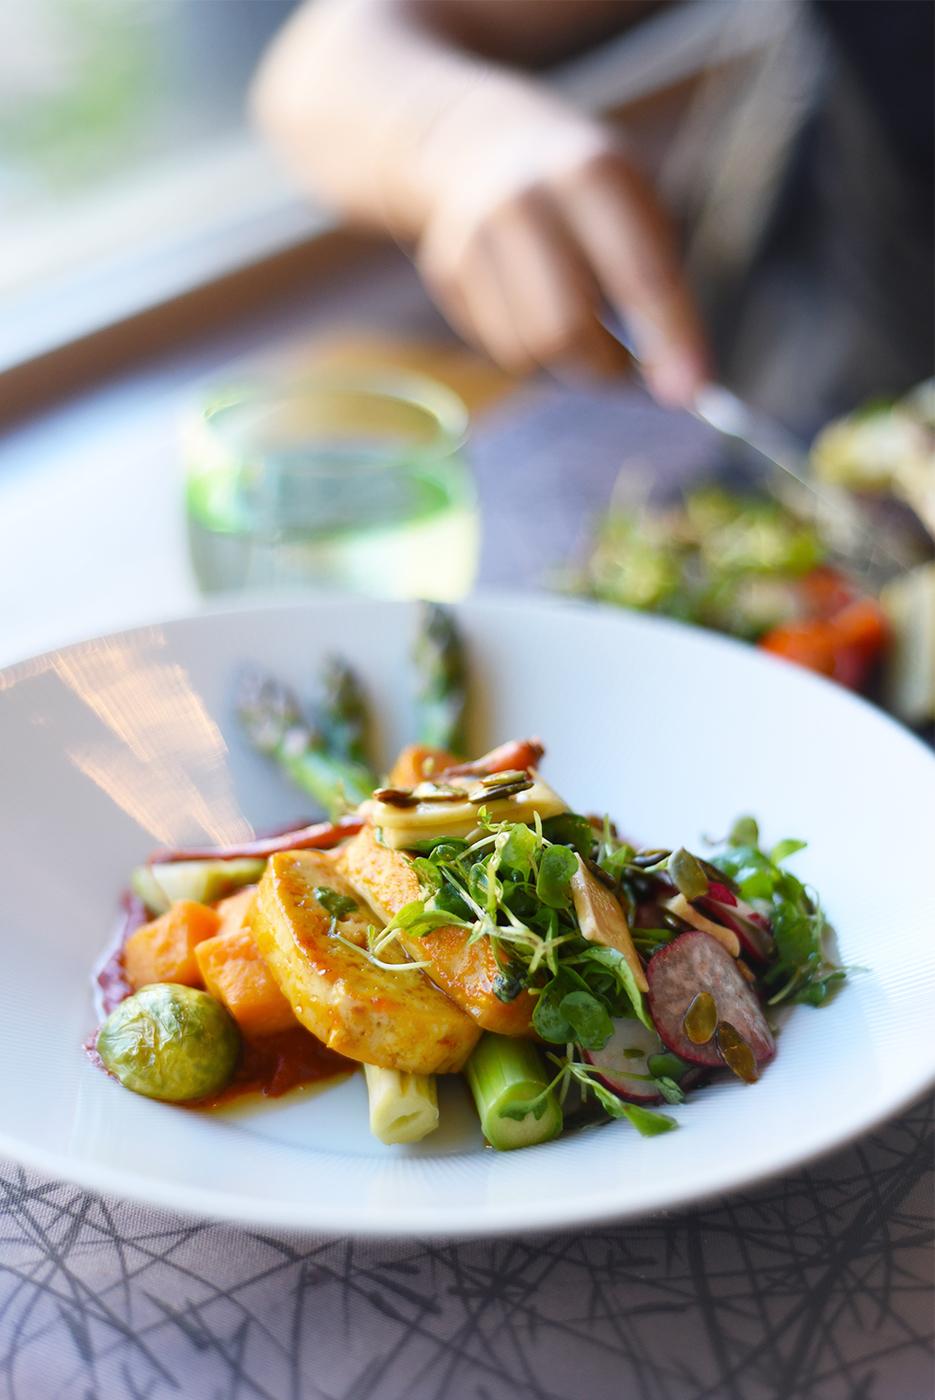 ravintola-kaarna-sok-helsinki-sundayblondie-1.jpg